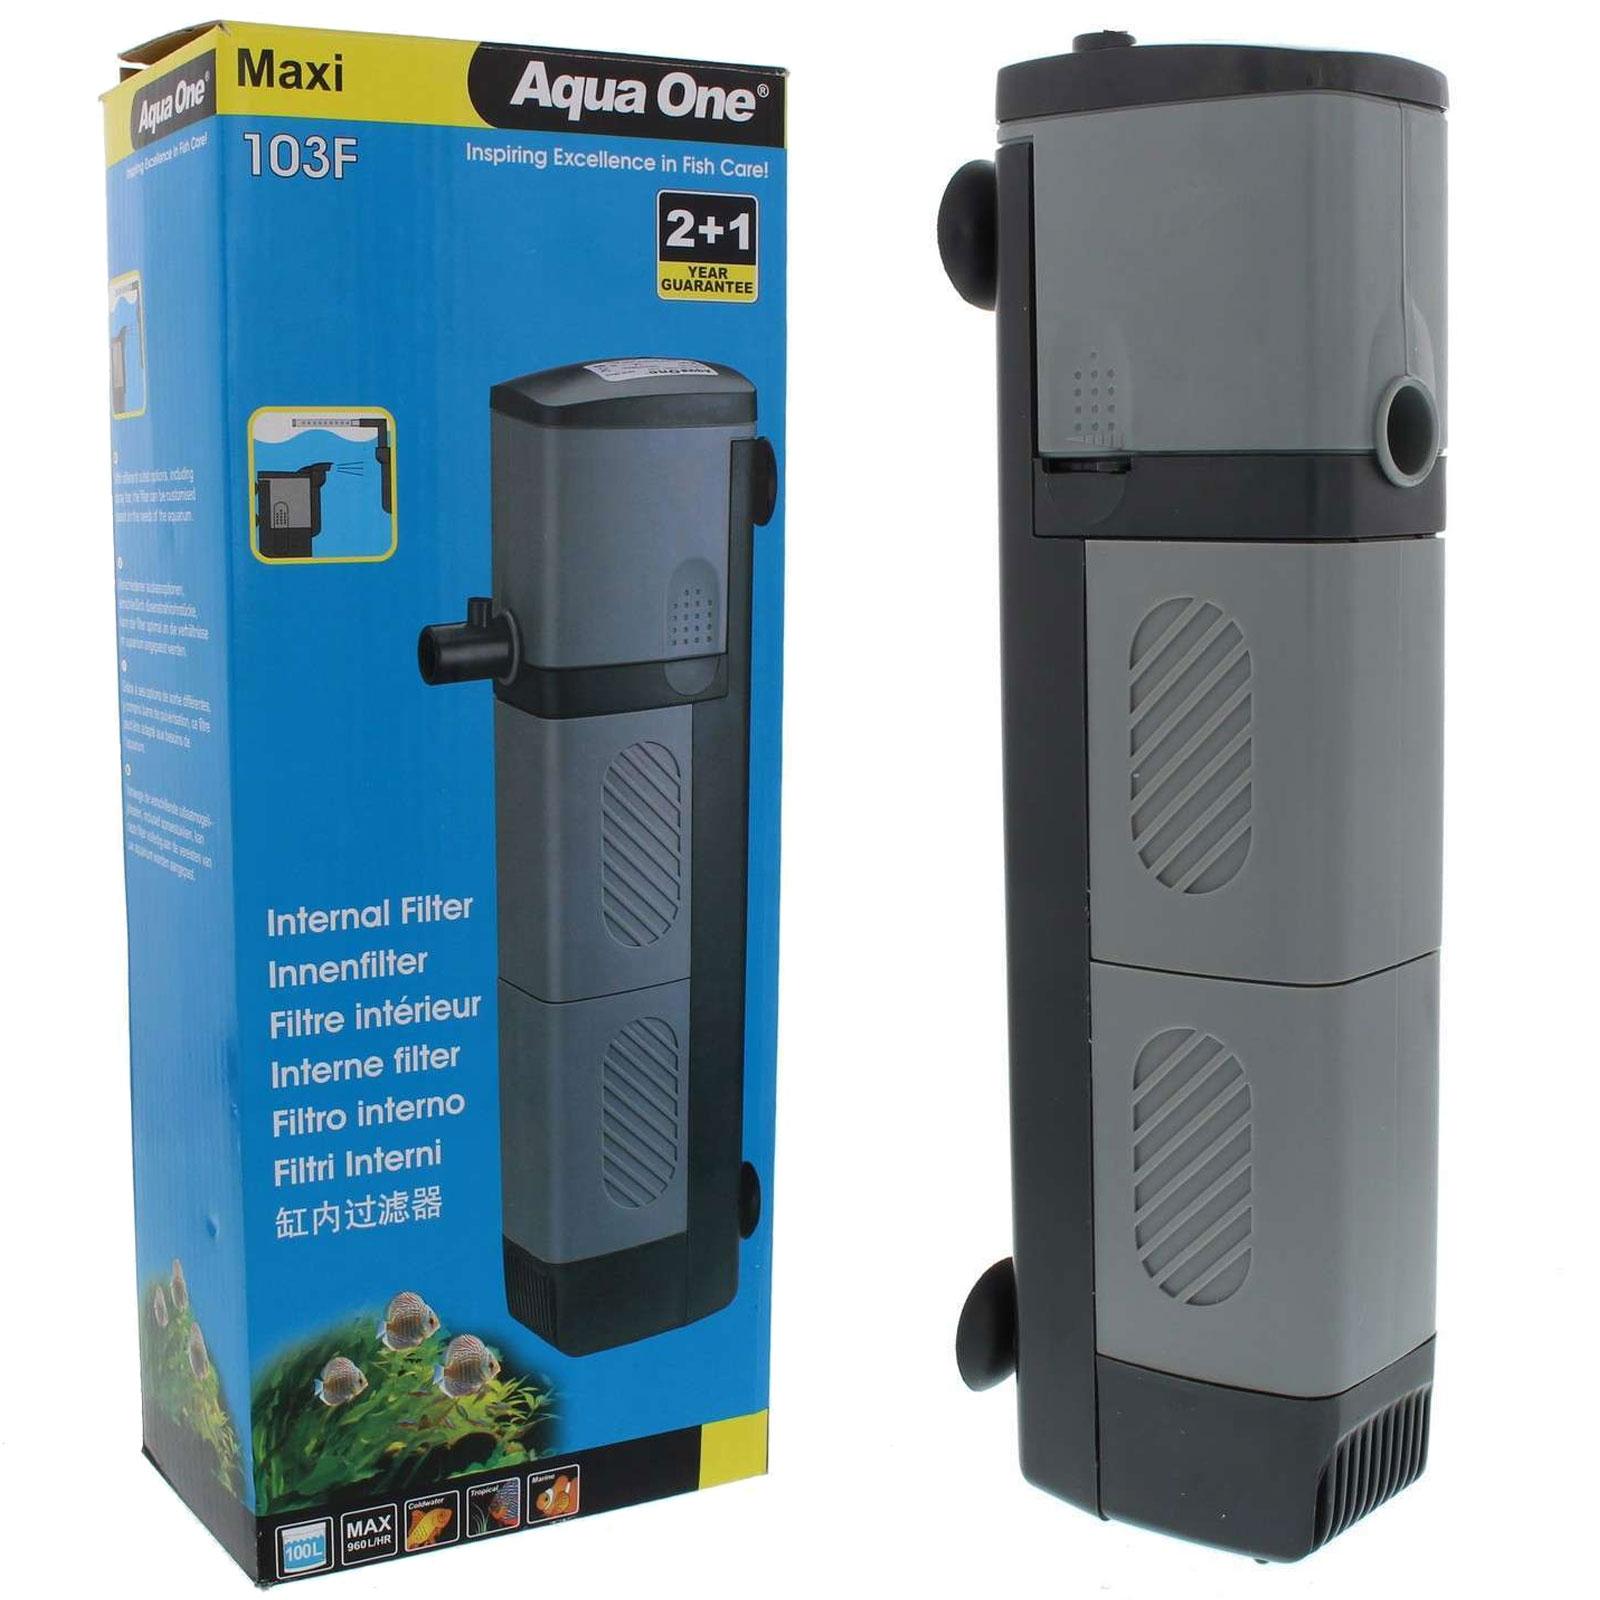 Aqua one maxi 103f internal aquarium power filter 960l h for Internal fish tank filter